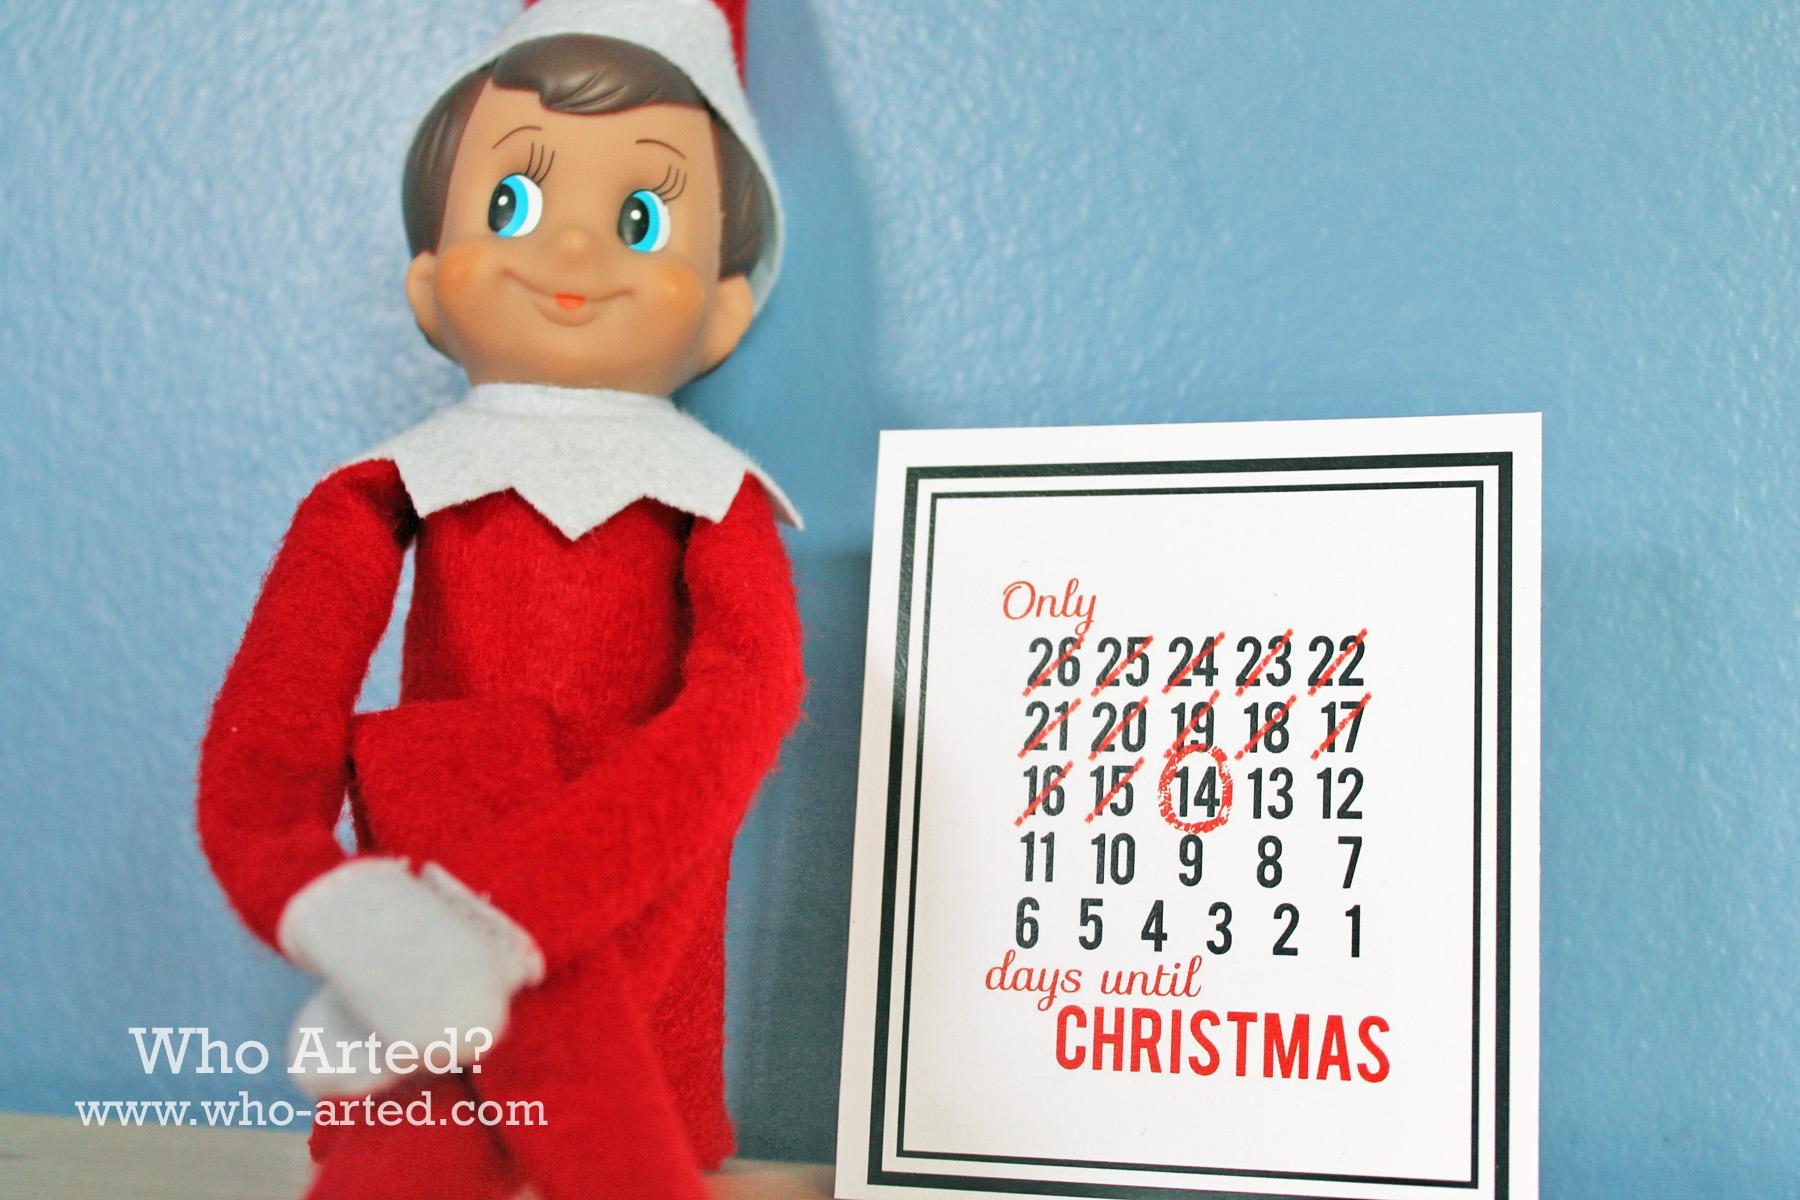 Free Elf on the Shelf Printables - Who Arted?